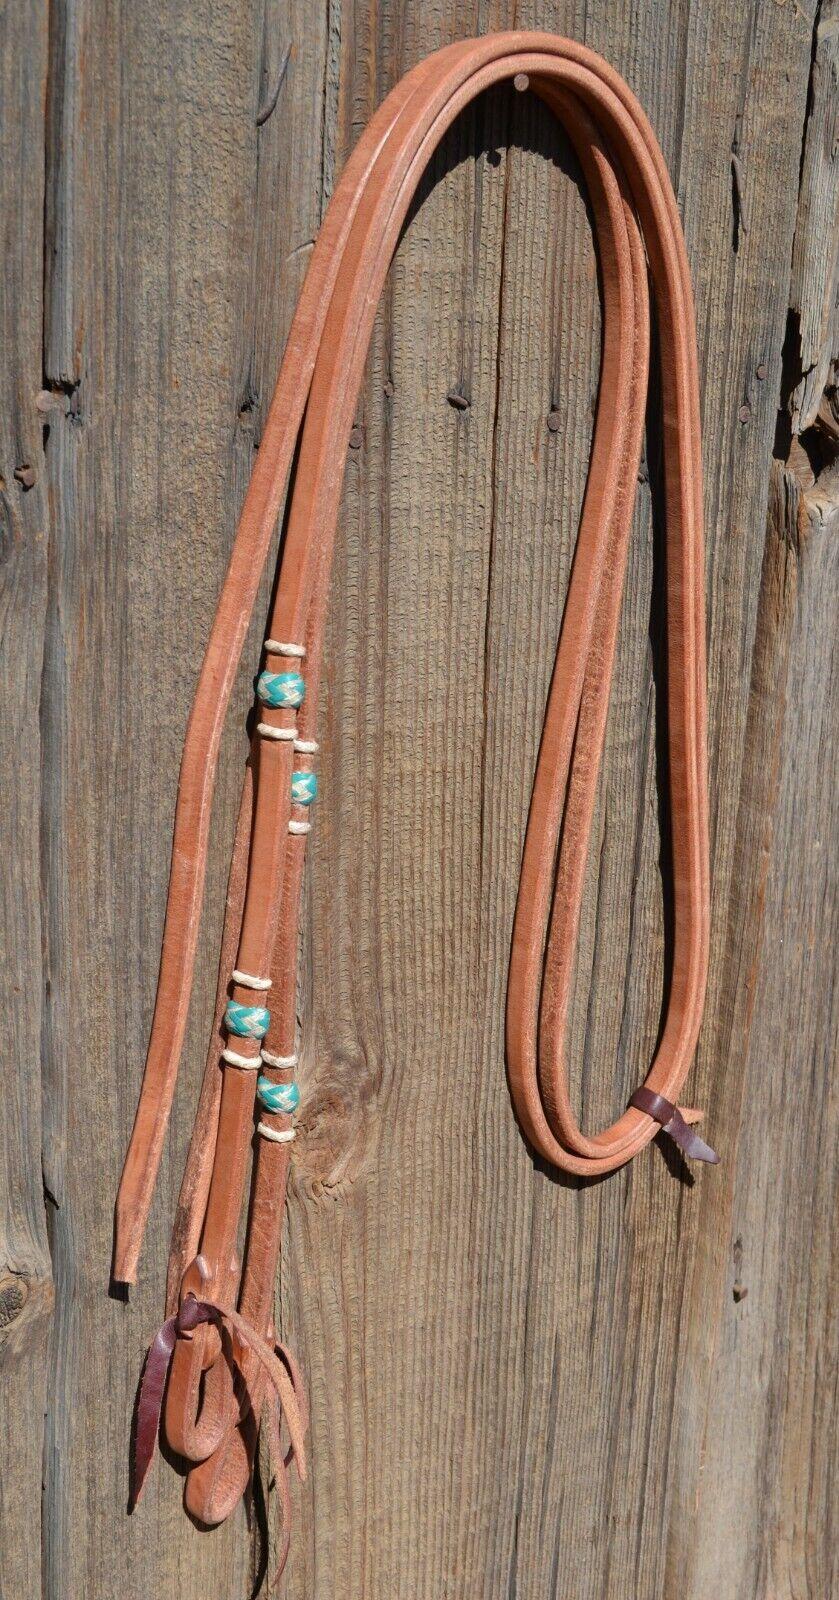 58Jose Ortiz Harness Split Reins Braided NaturalTurquoise Rawhide Knots 8 ft.